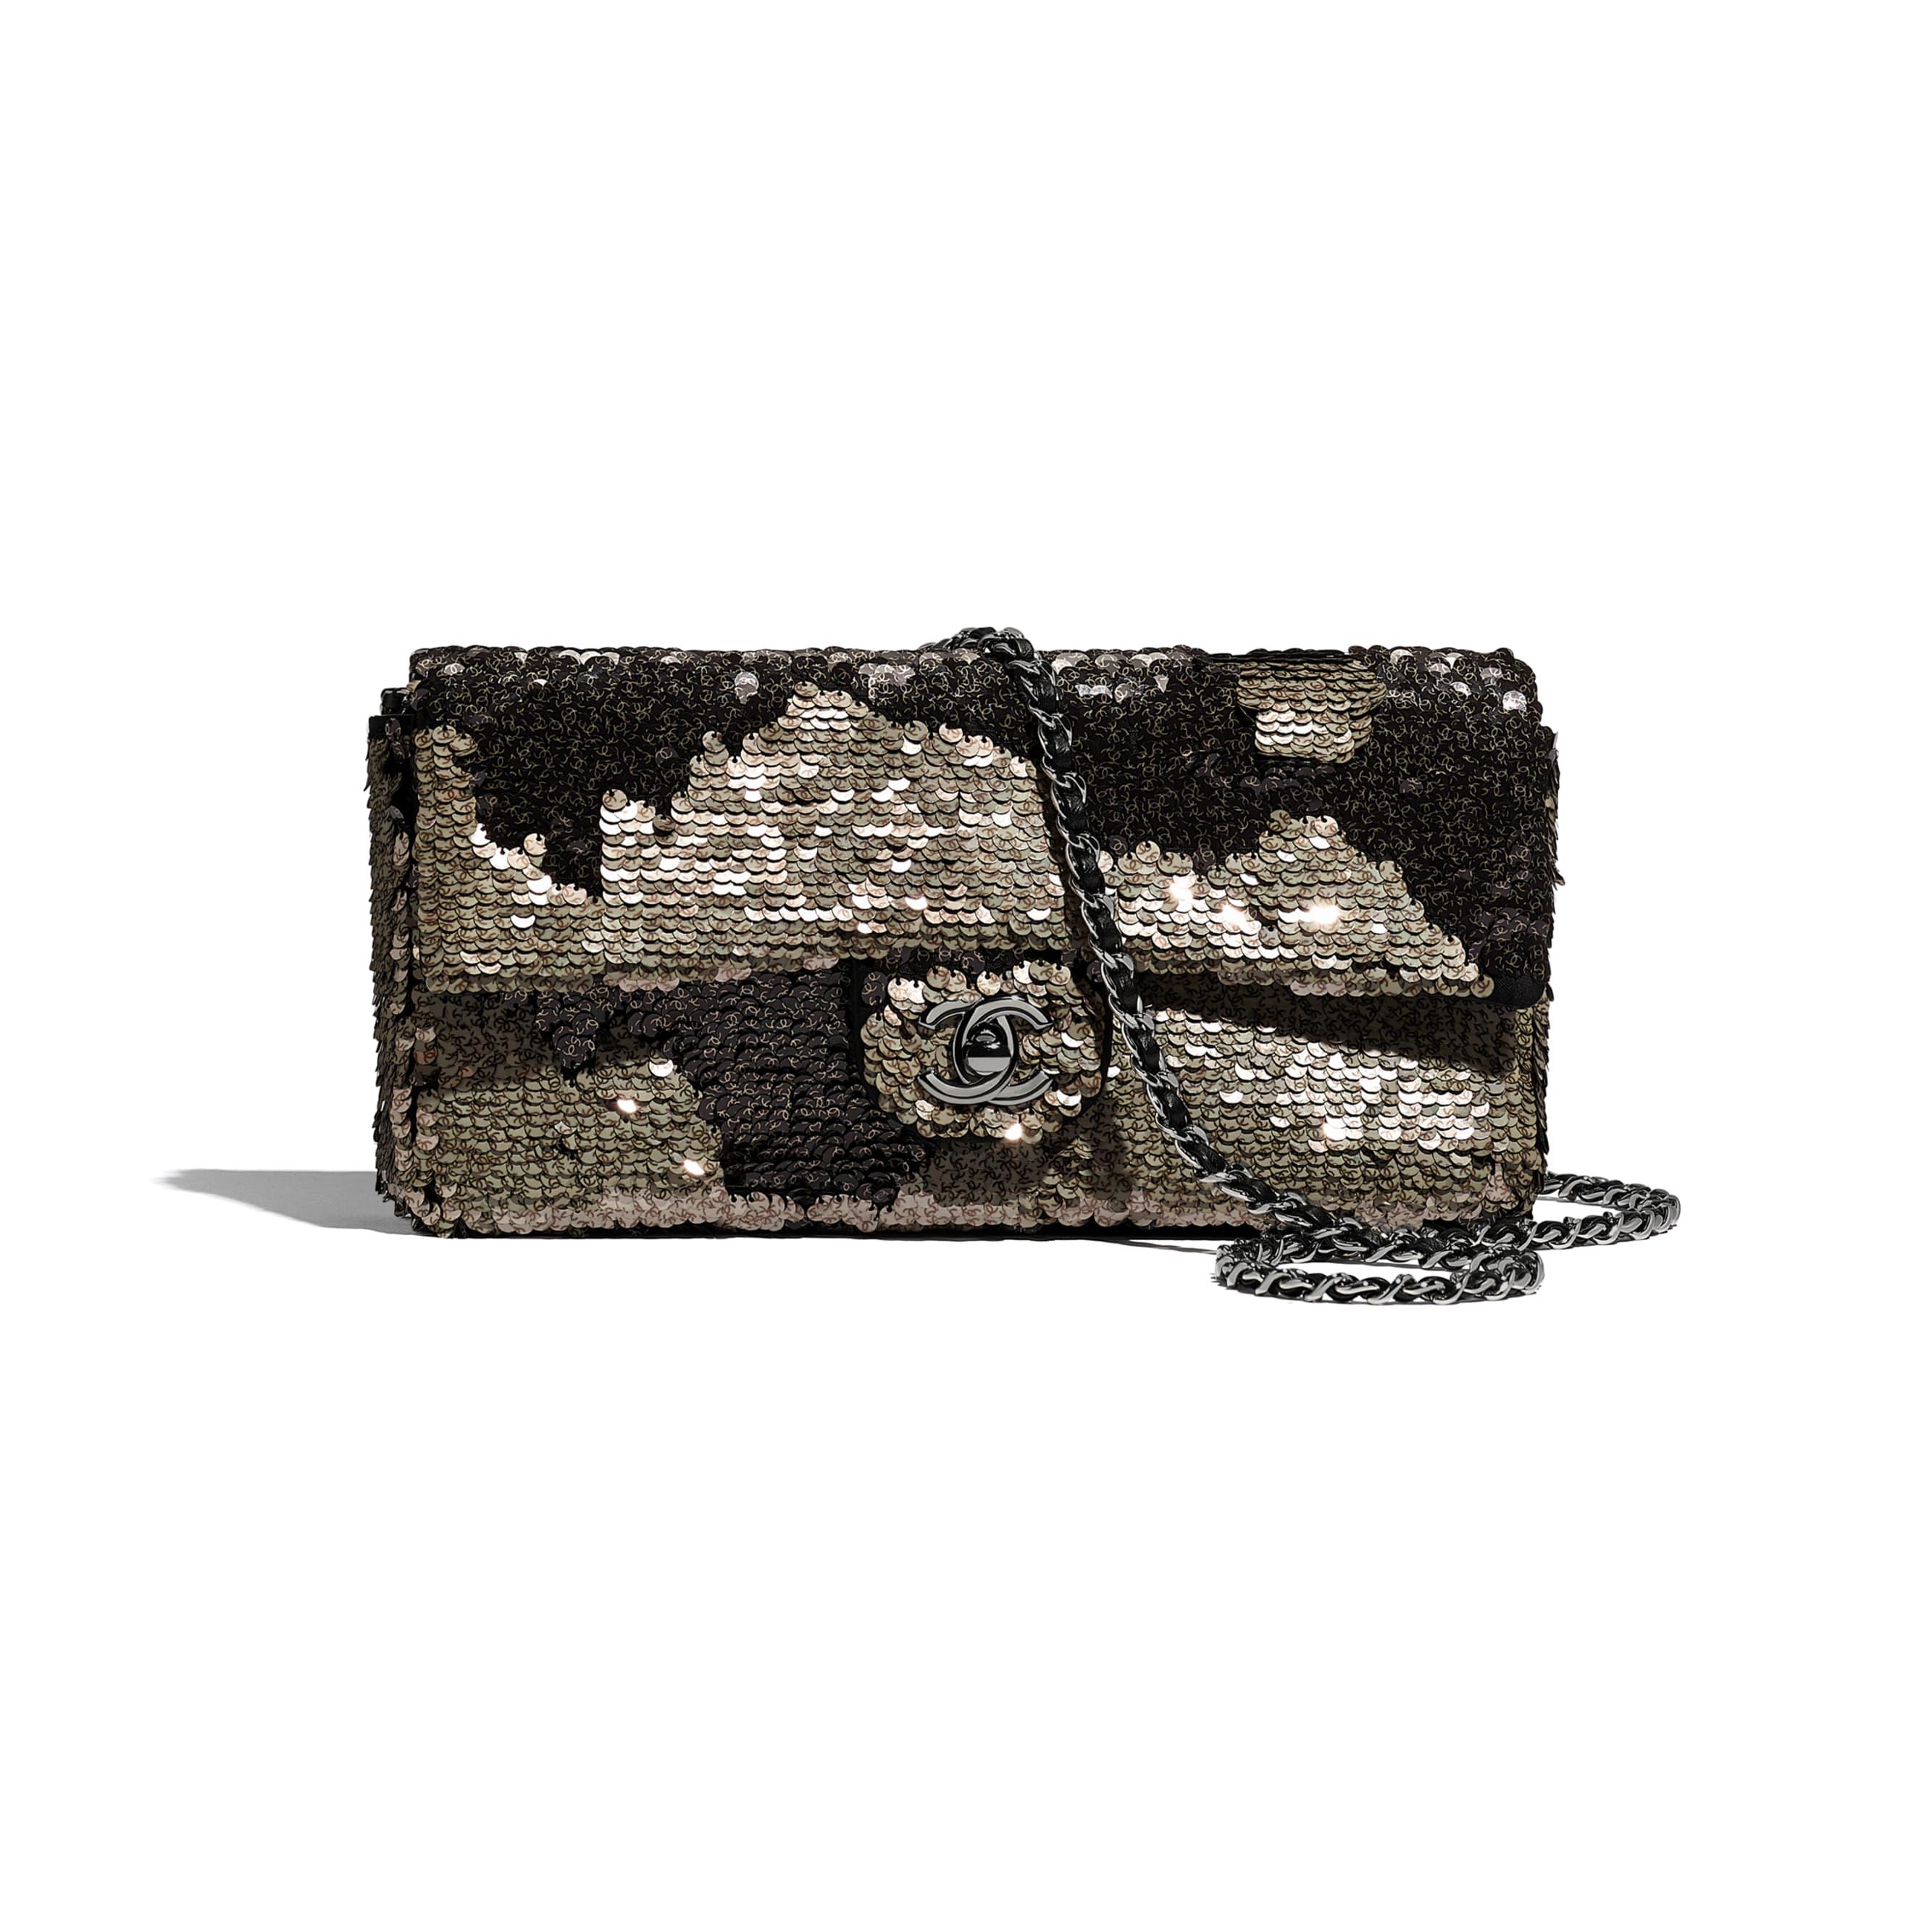 Flap Bag - Beige & Black - Sequins, Lambskin & Ruthenium-Finish Metal - CHANEL - Default view - see standard sized version